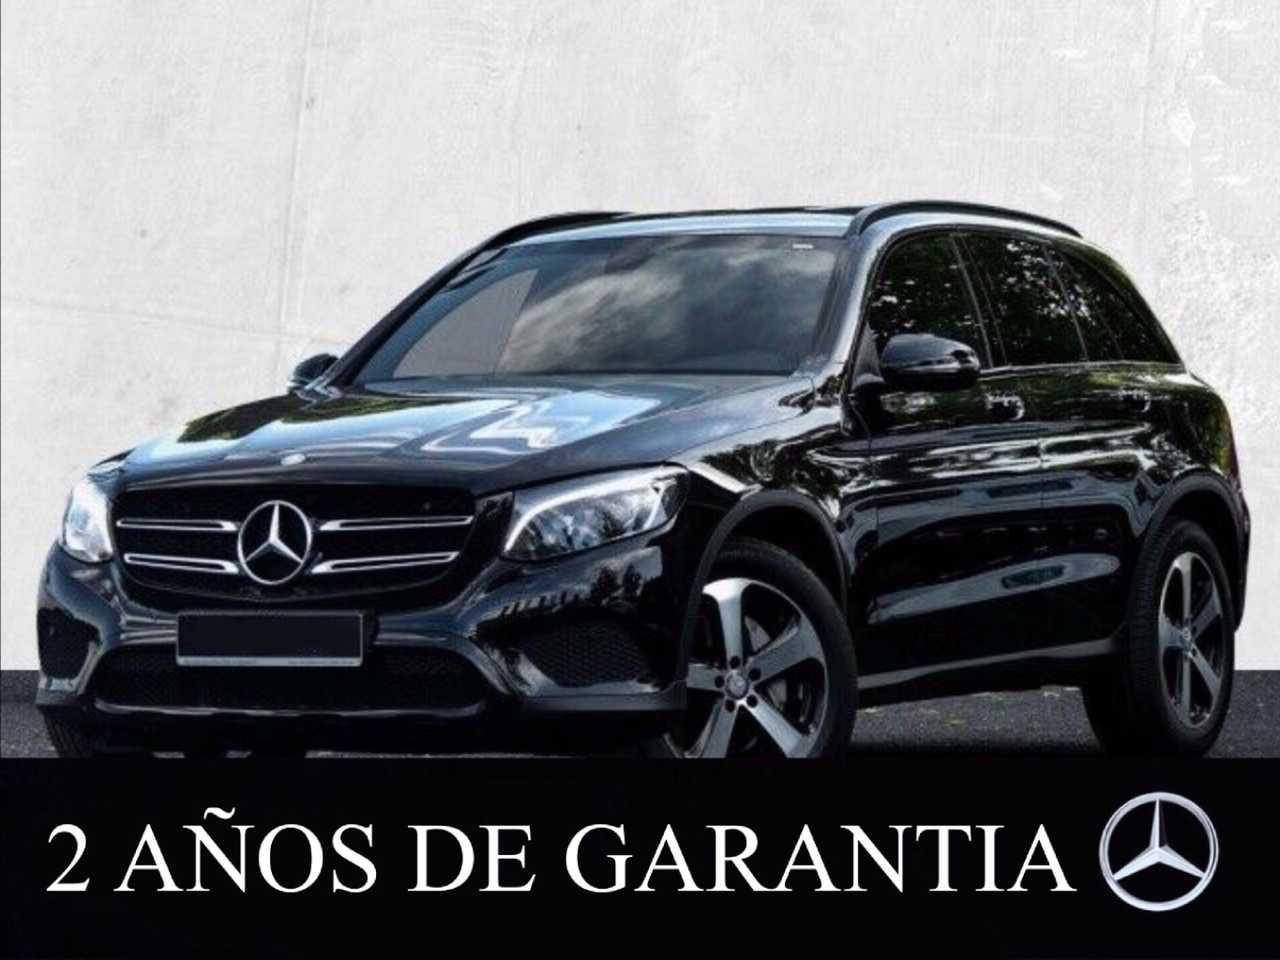 Mercedes GLC 250 d 4 MATIC AUT. / AMG / PAQUETE NIGHT   - Foto 1